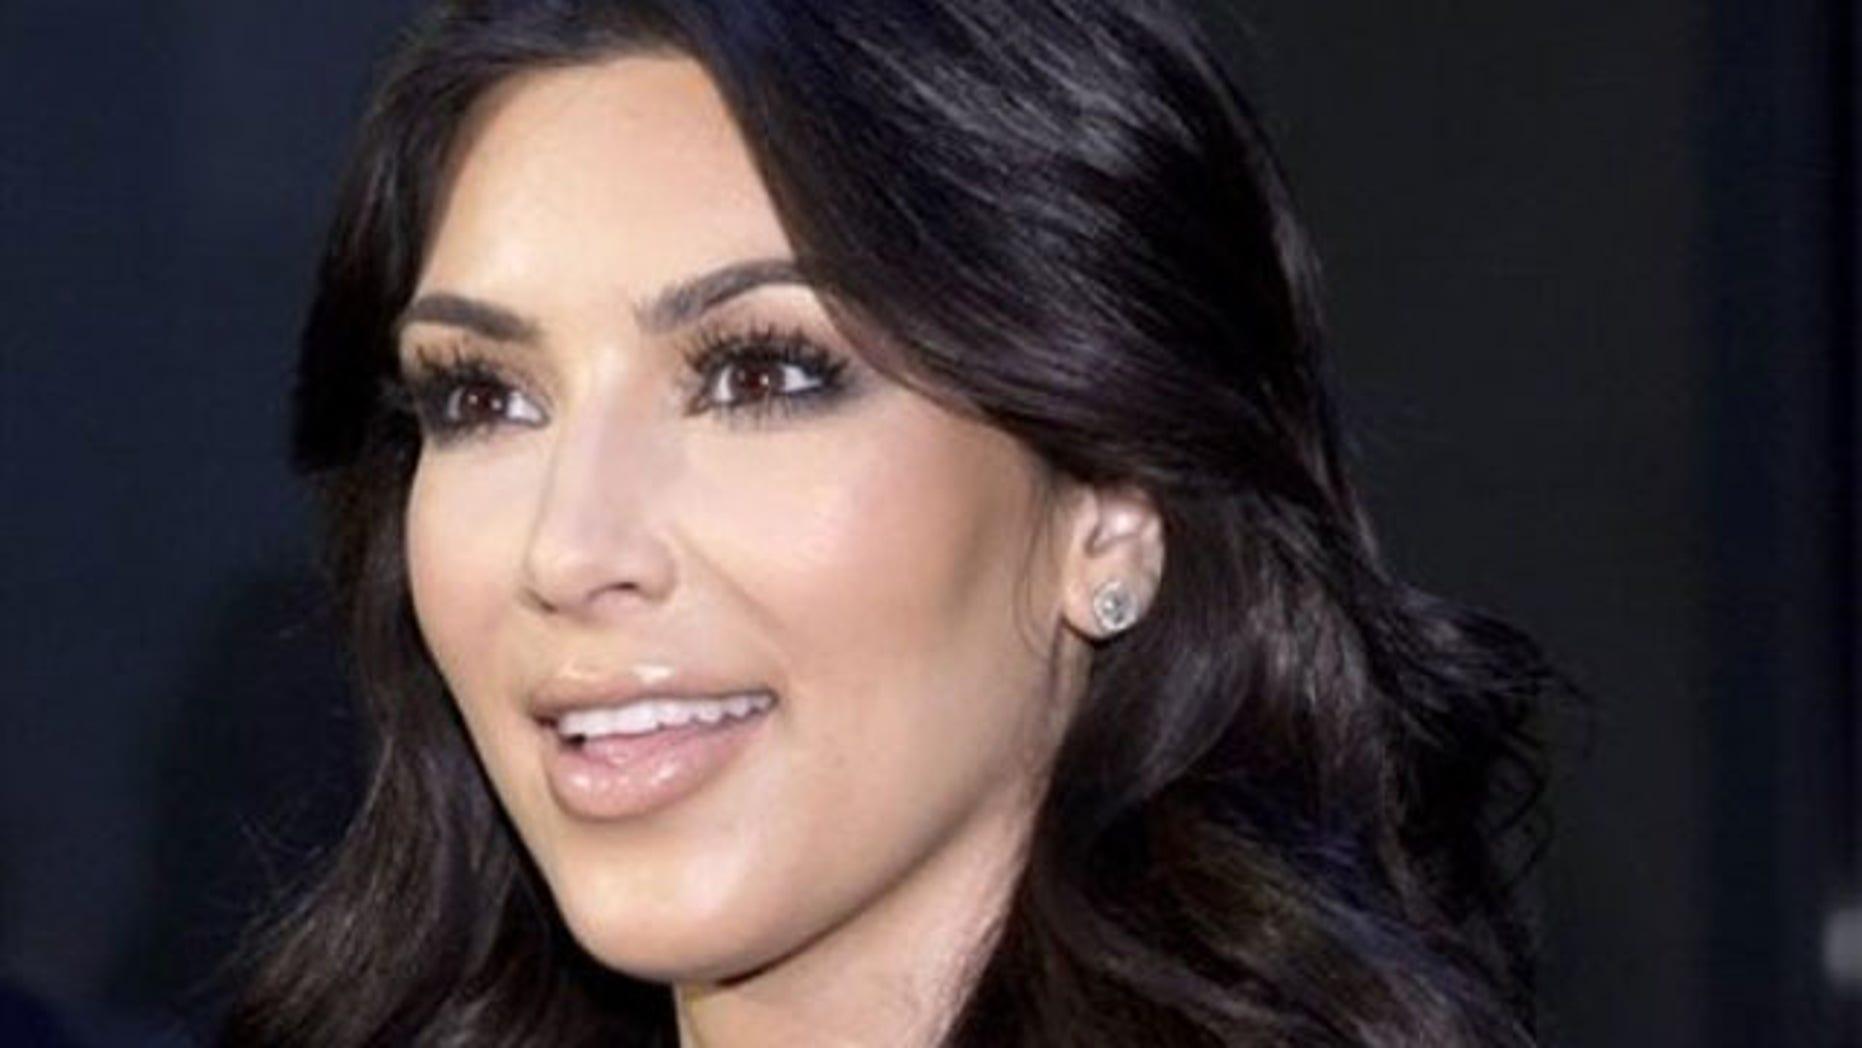 Alison Arngrim Nude 411 links: why kim kardashian's latest nude photos made her